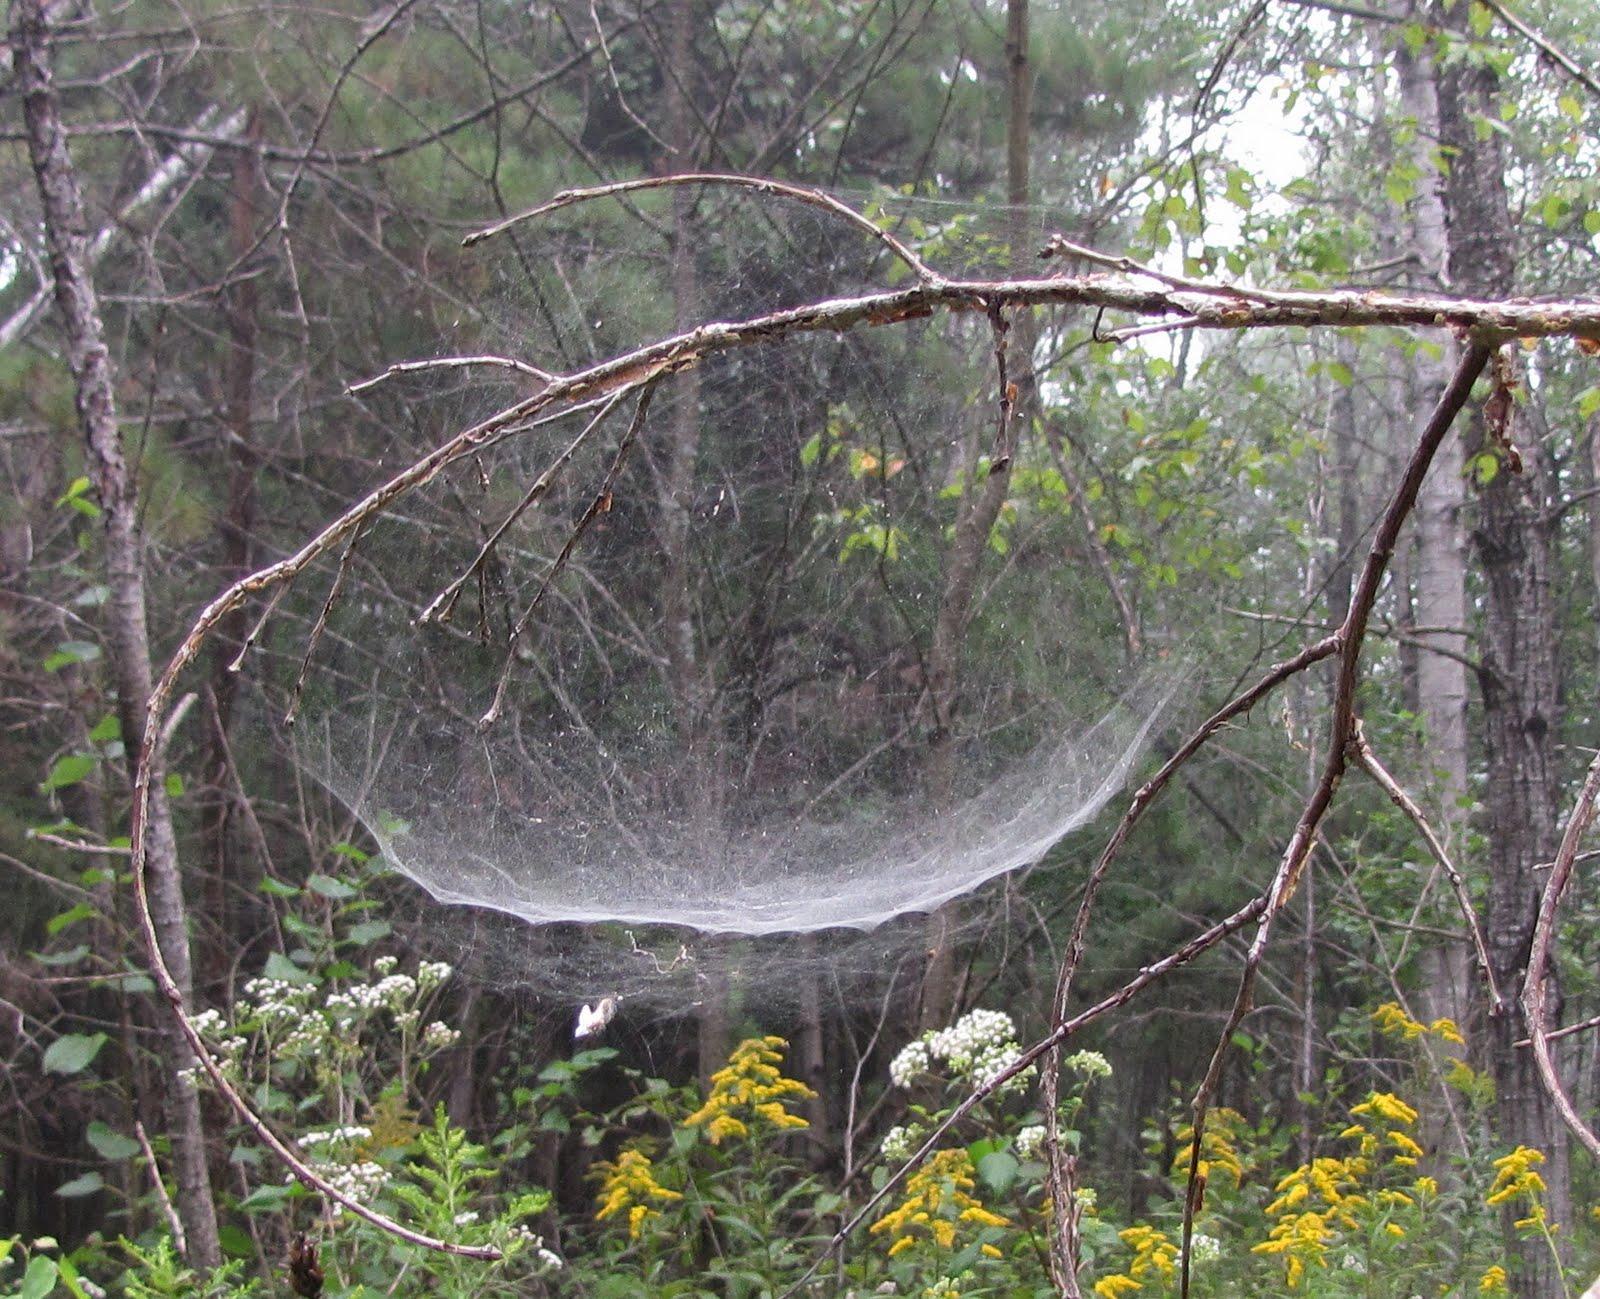 Bug Eric: Spider Sunday: Bowl & Doily Spider Bowl And Doily Weaver Spider